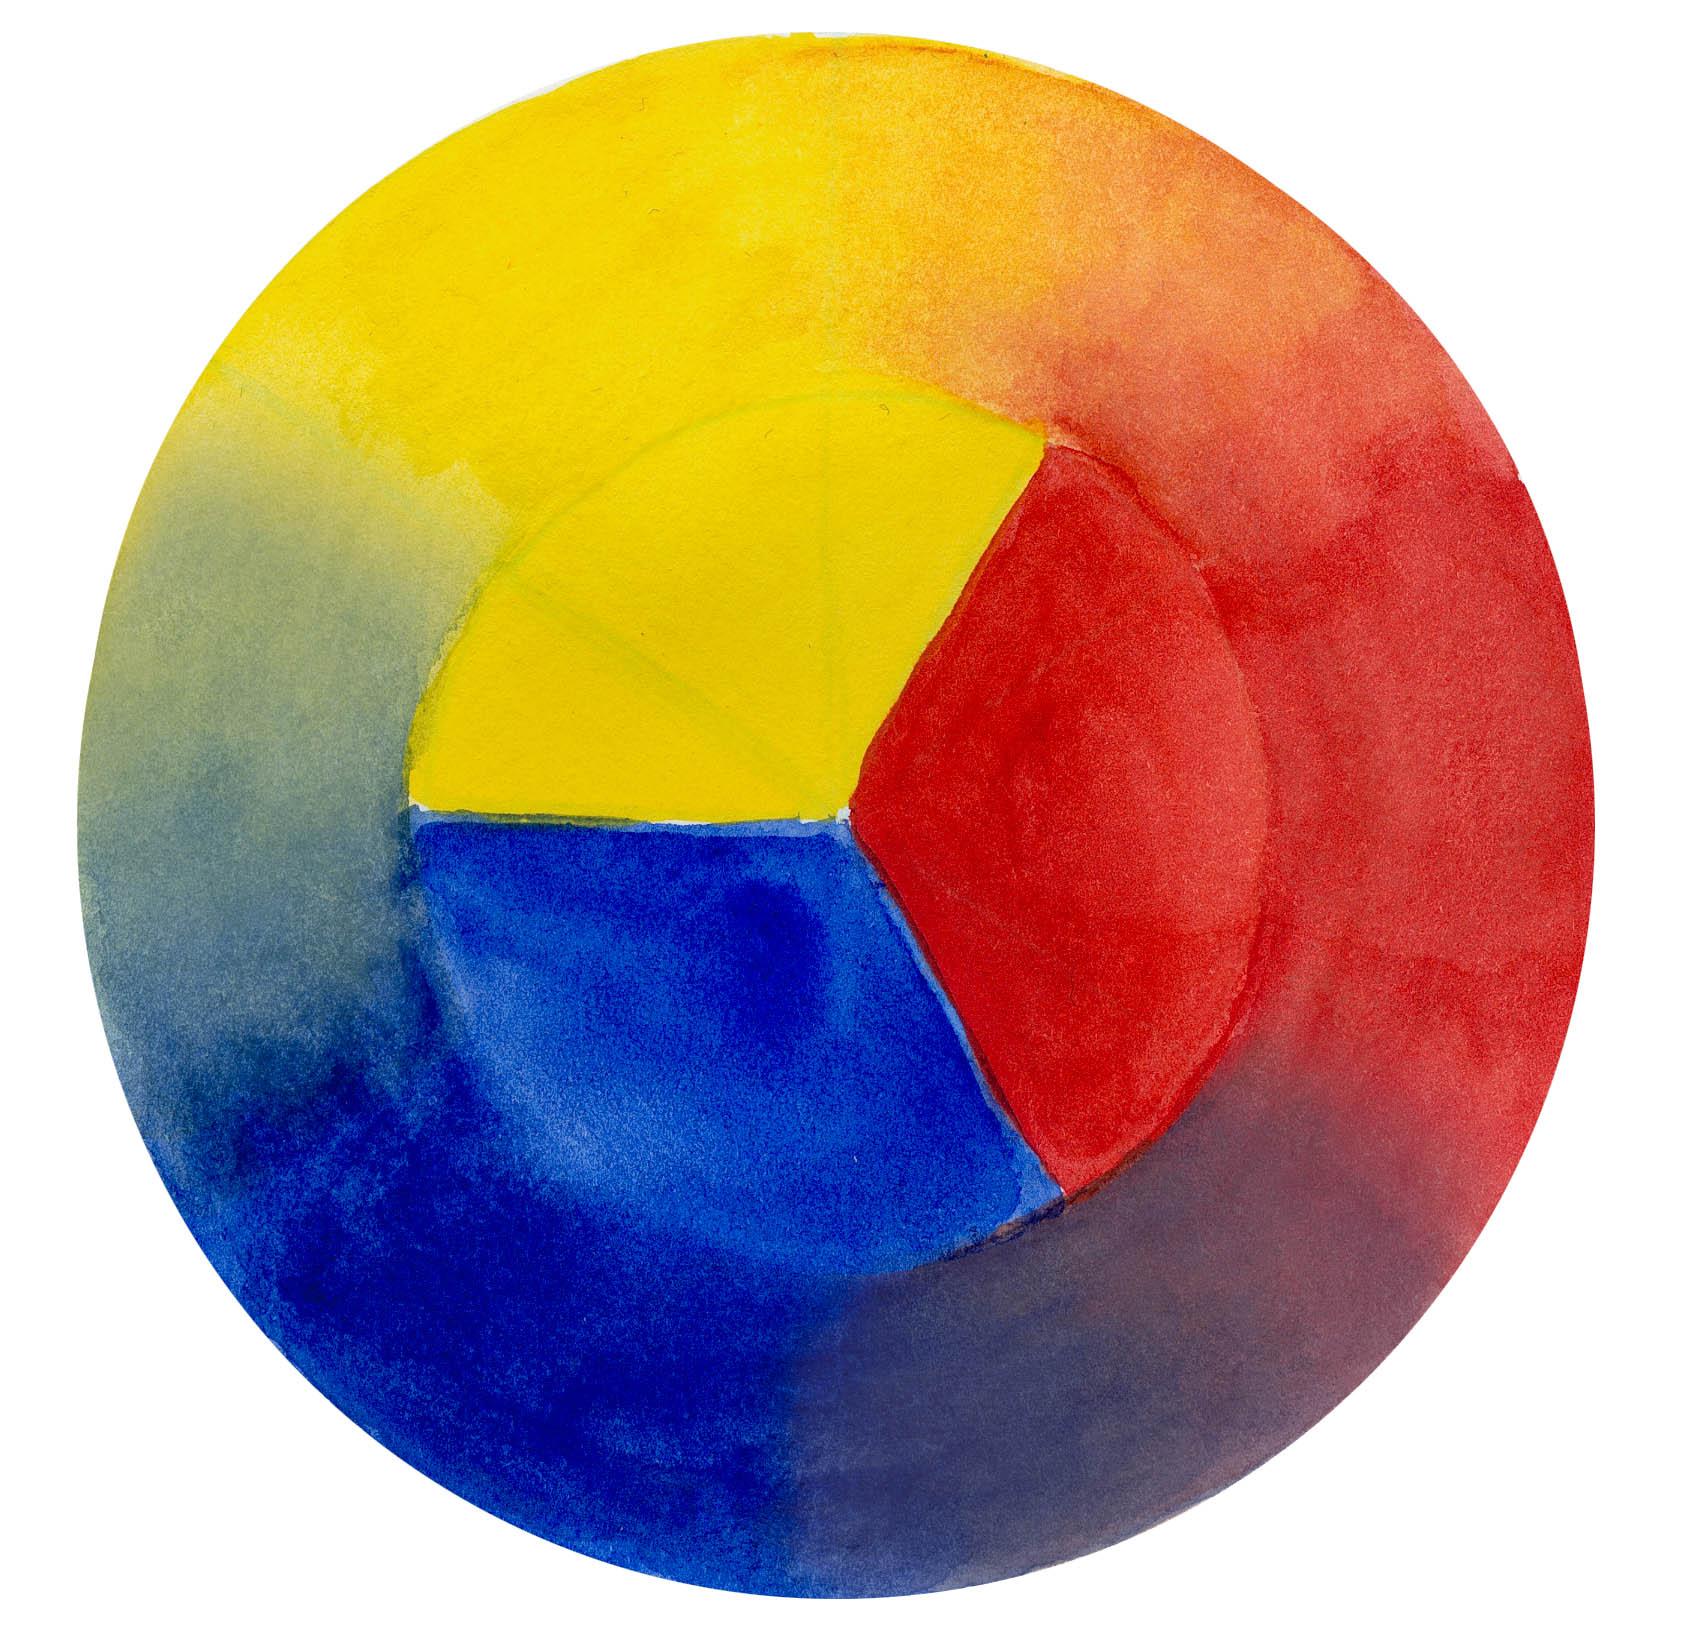 red yellow blue color wheel john muir laws. Black Bedroom Furniture Sets. Home Design Ideas